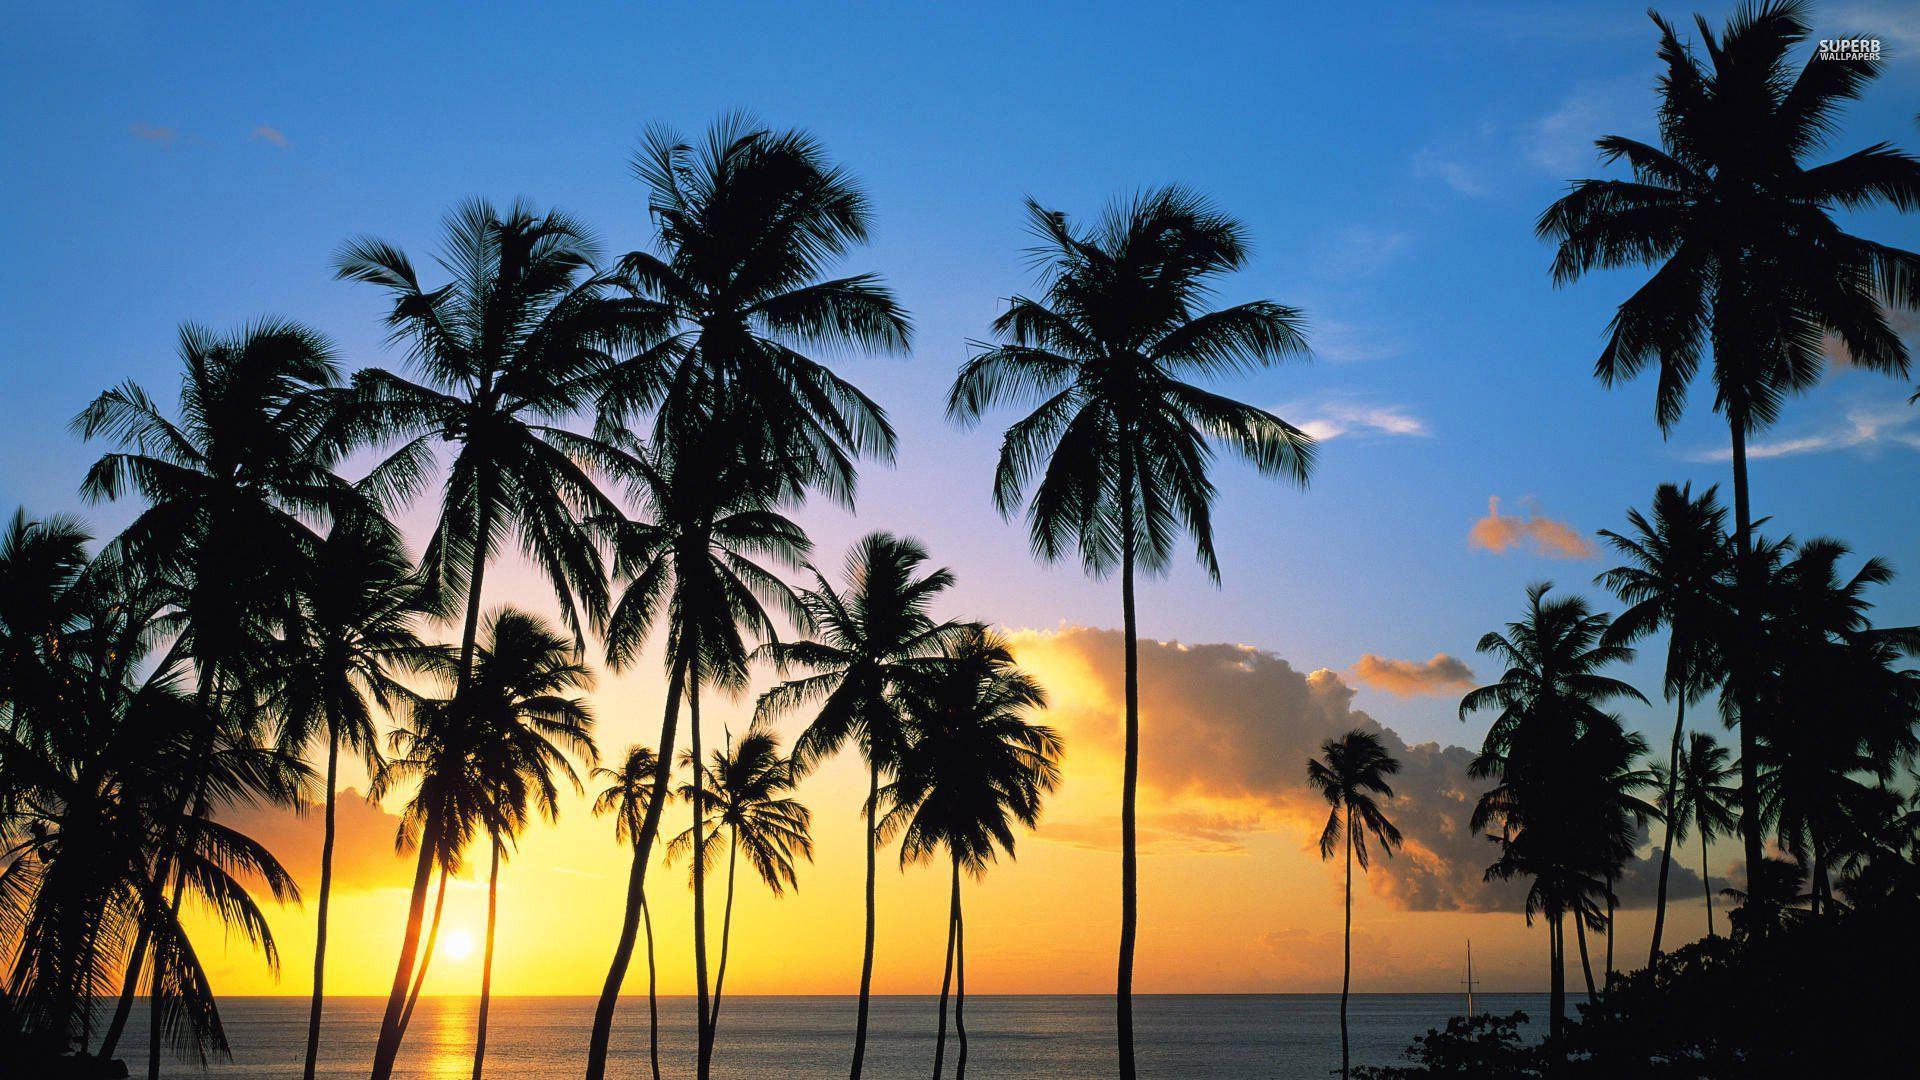 California palm trees wallpaper wallpapersafari - Free palm tree screensavers ...